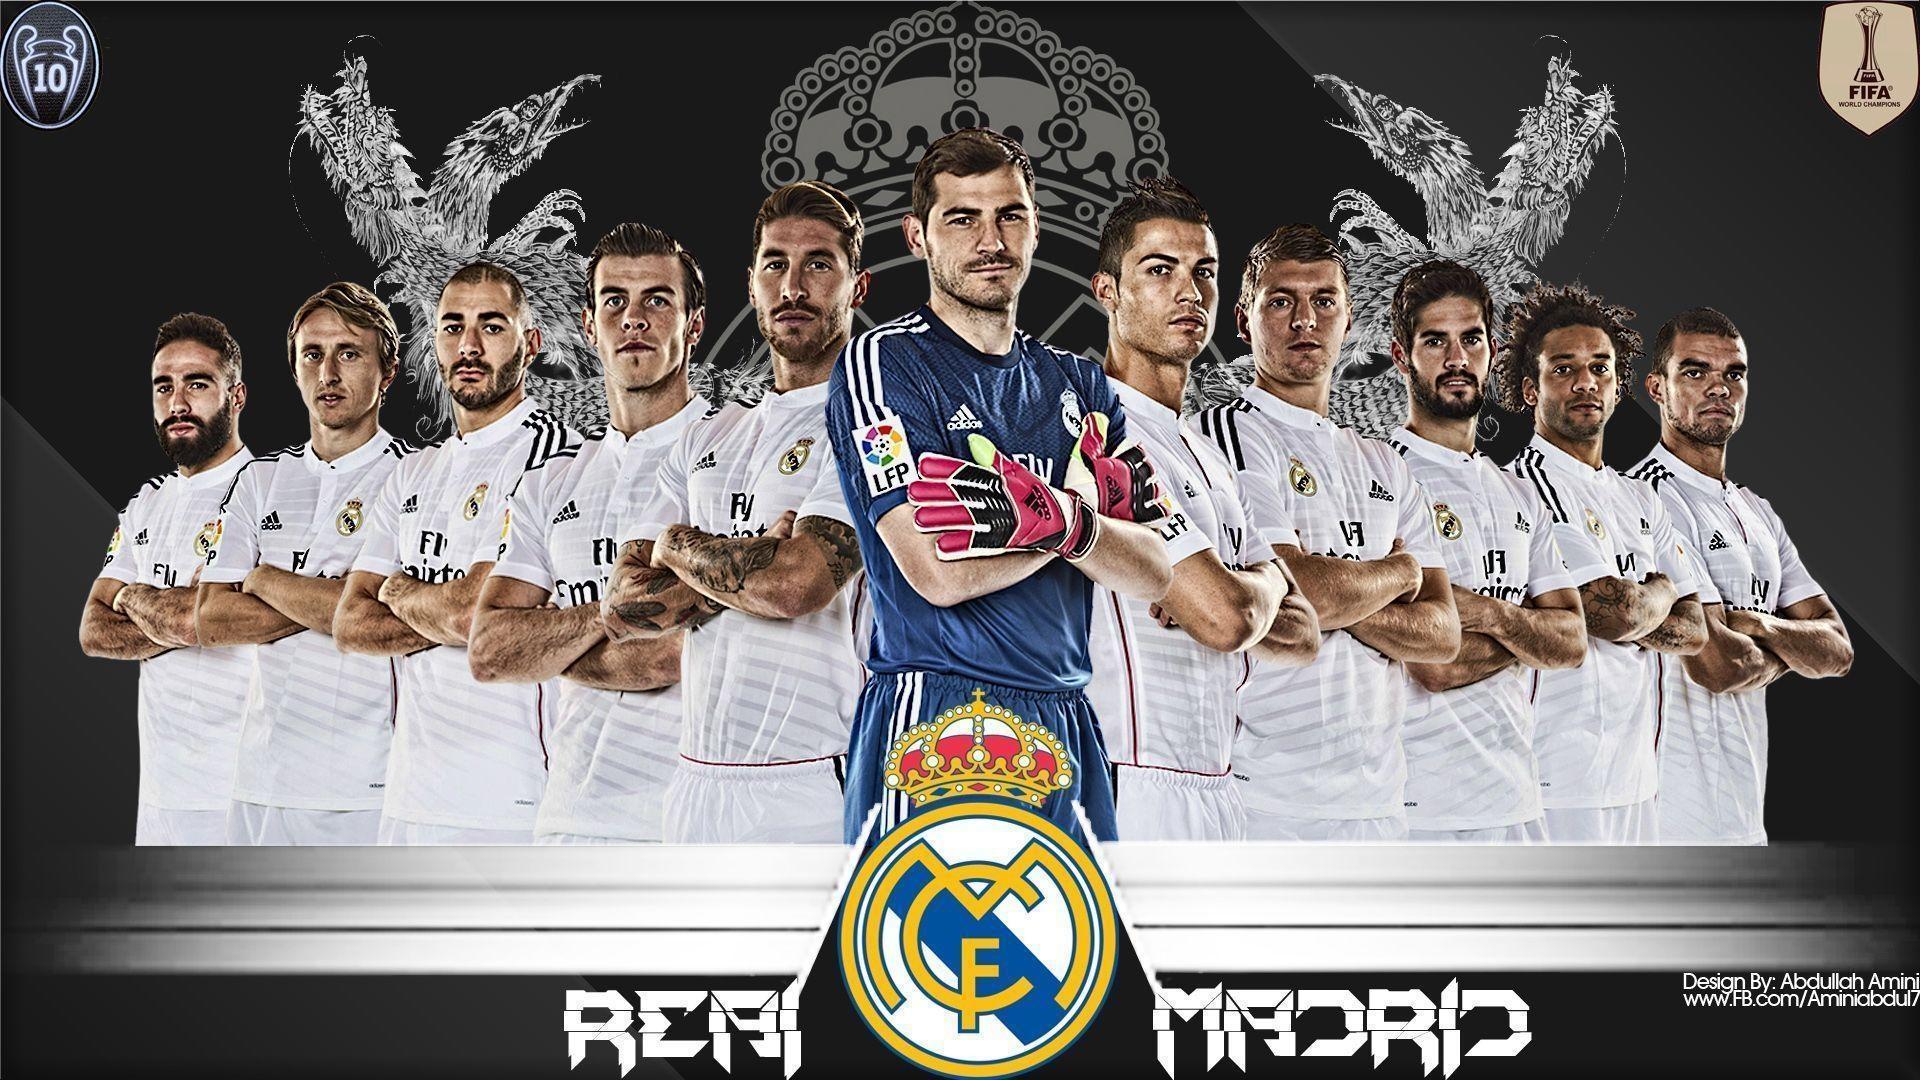 New Real Madrid Wallpapers Full Hd Soccer Wallpaper 1920x1080